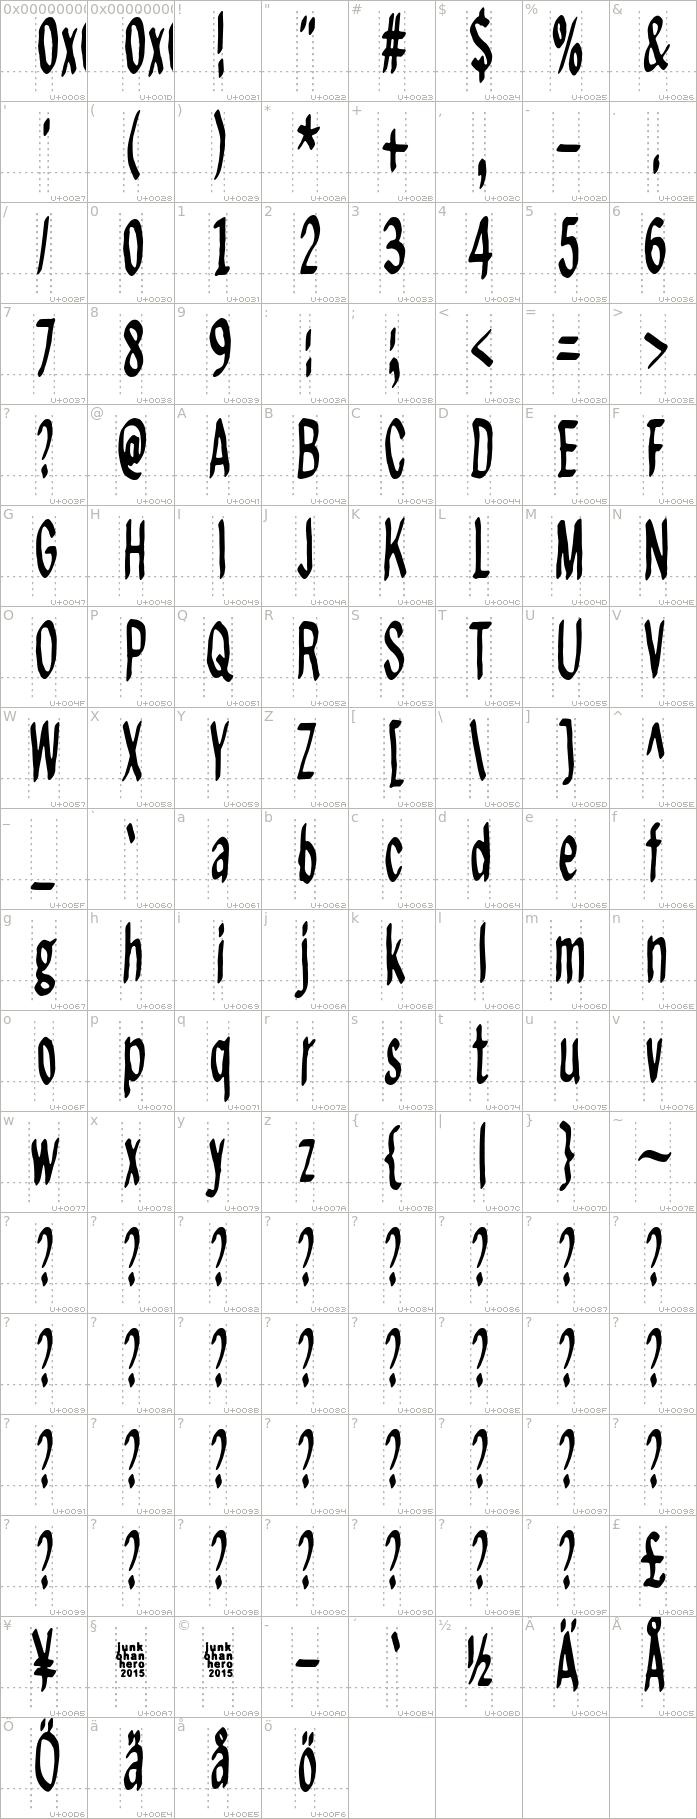 regurgance.regular.character-map-1